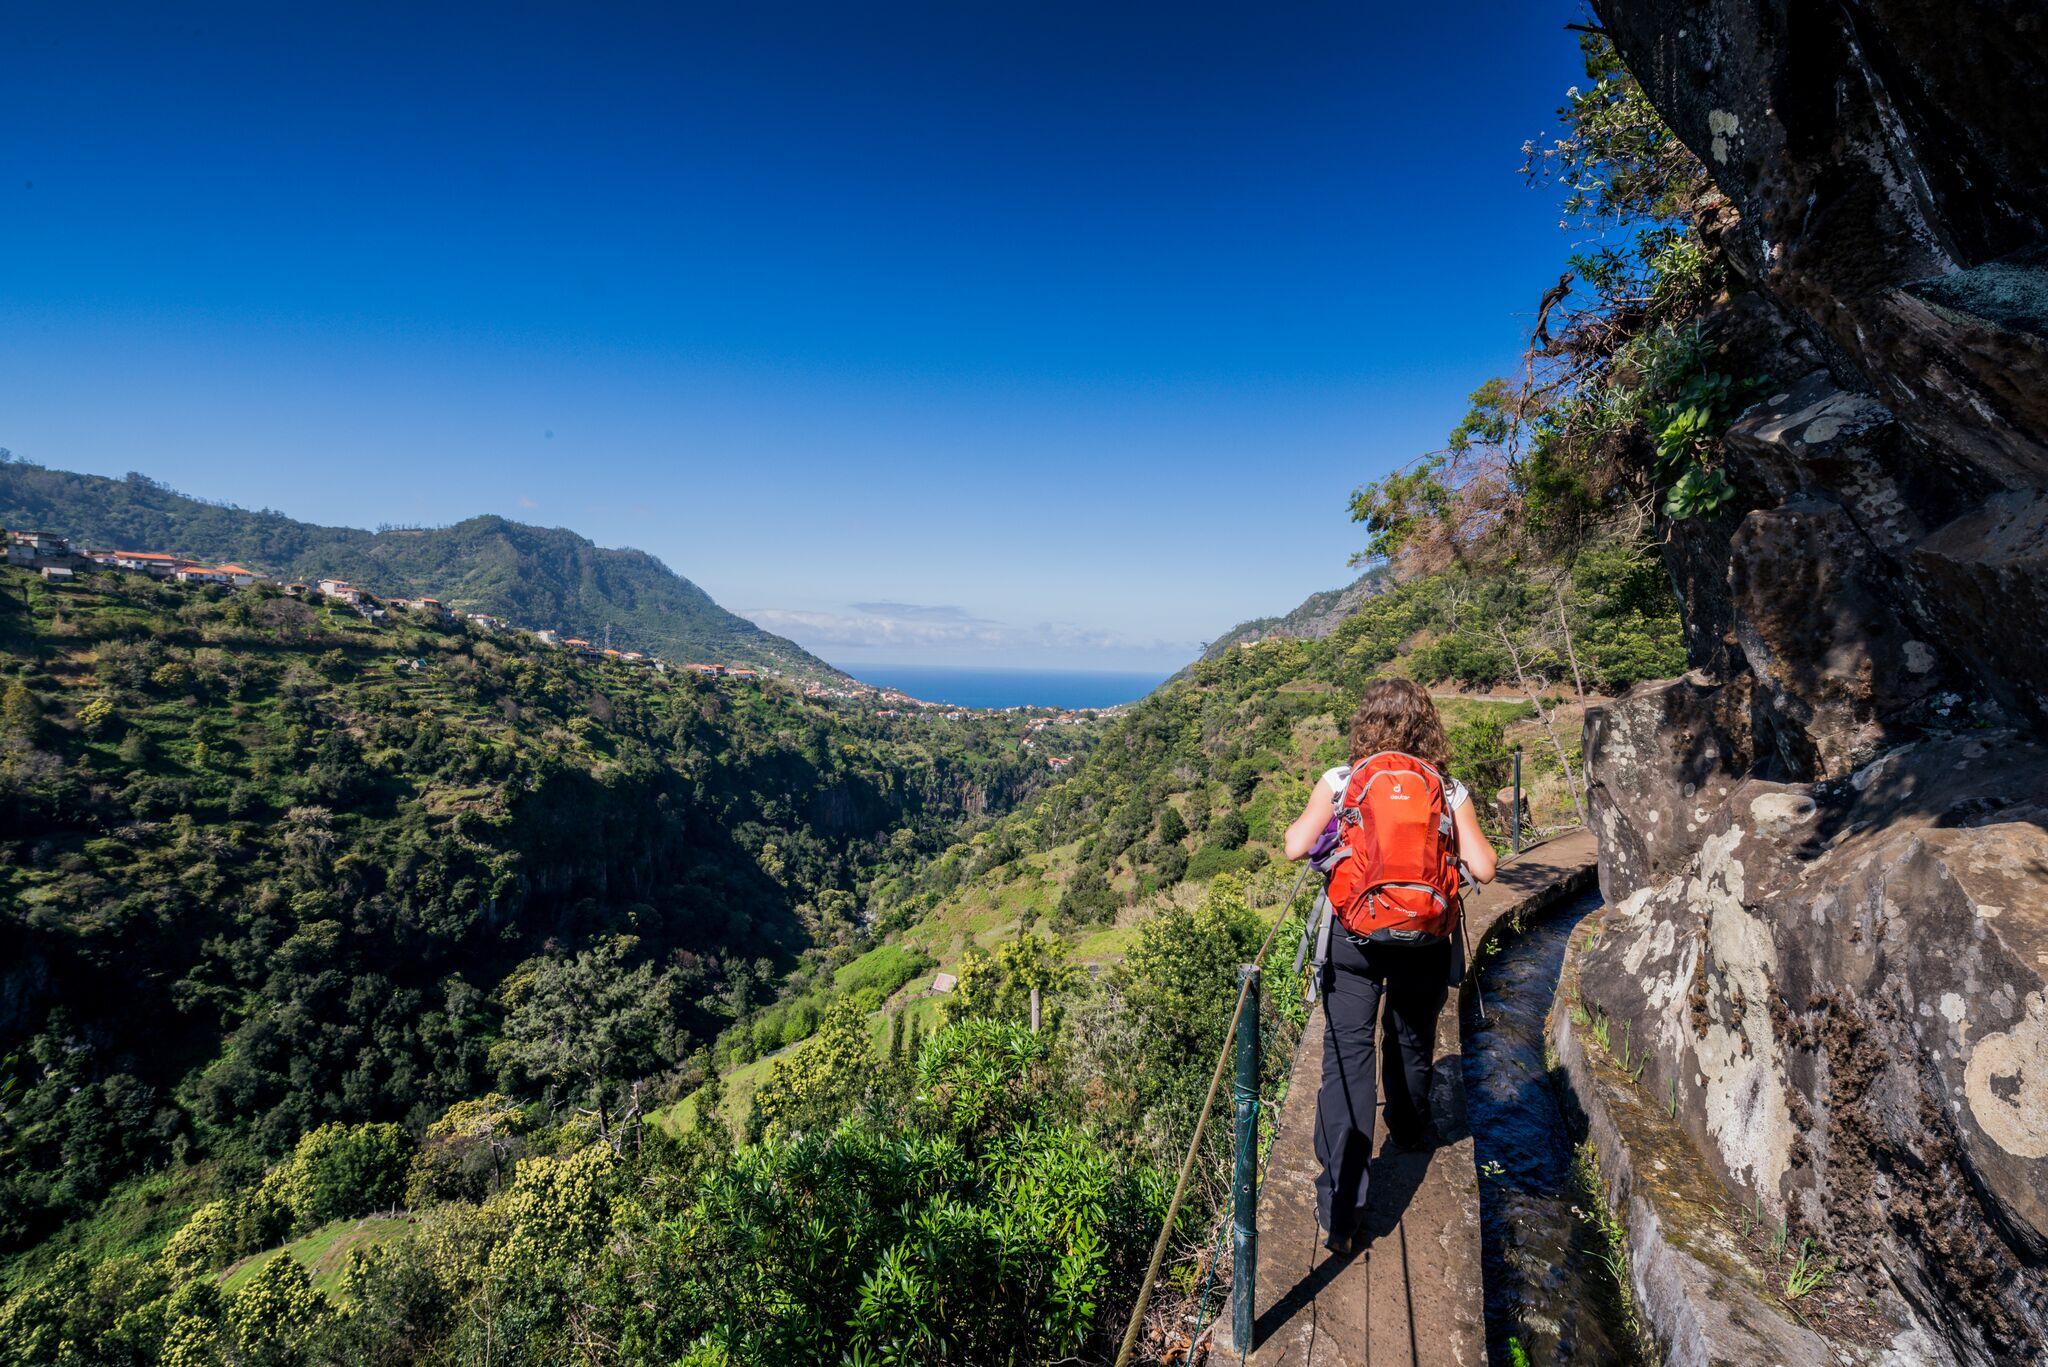 Ilha da Madeira melhor ilha